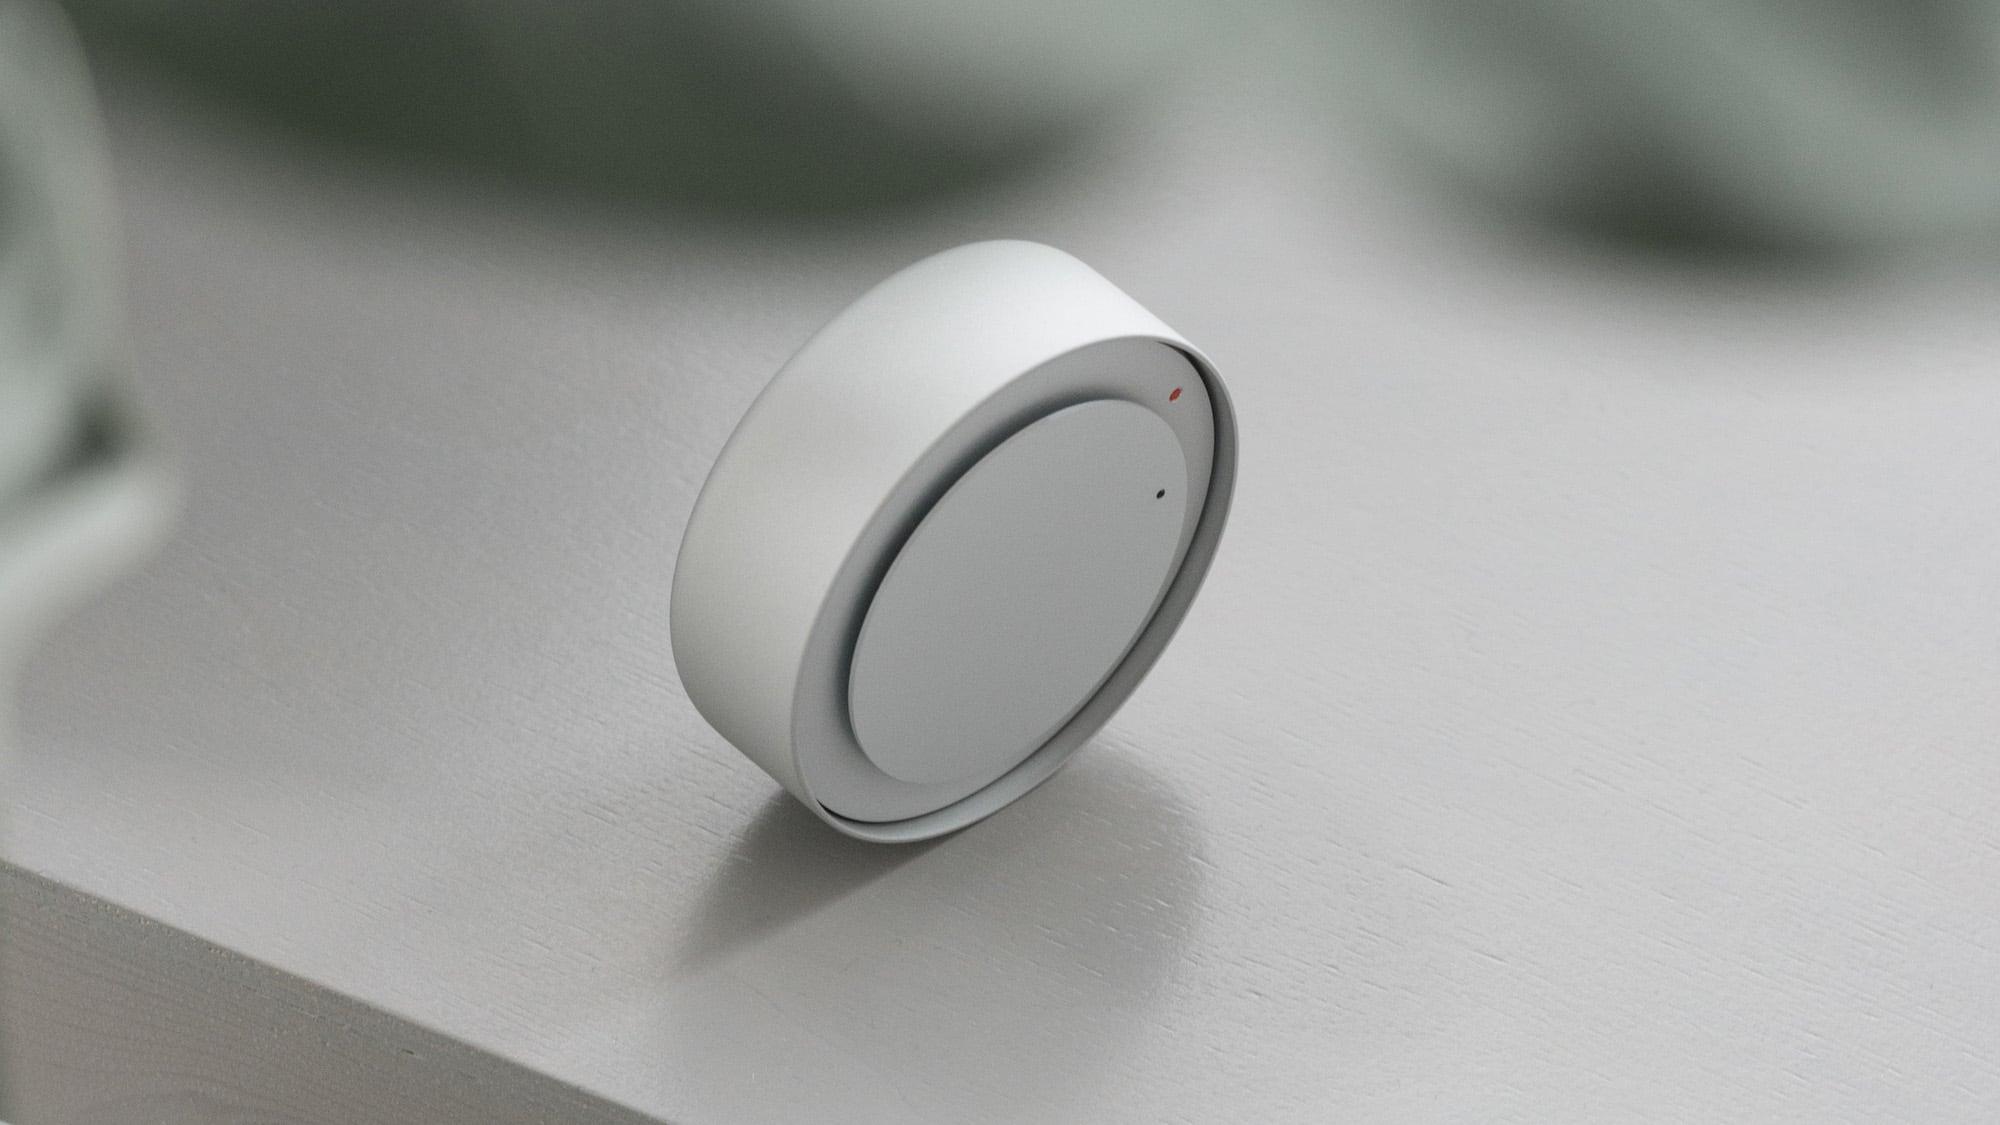 Remi van Oers time 2.1 Innovative Clock